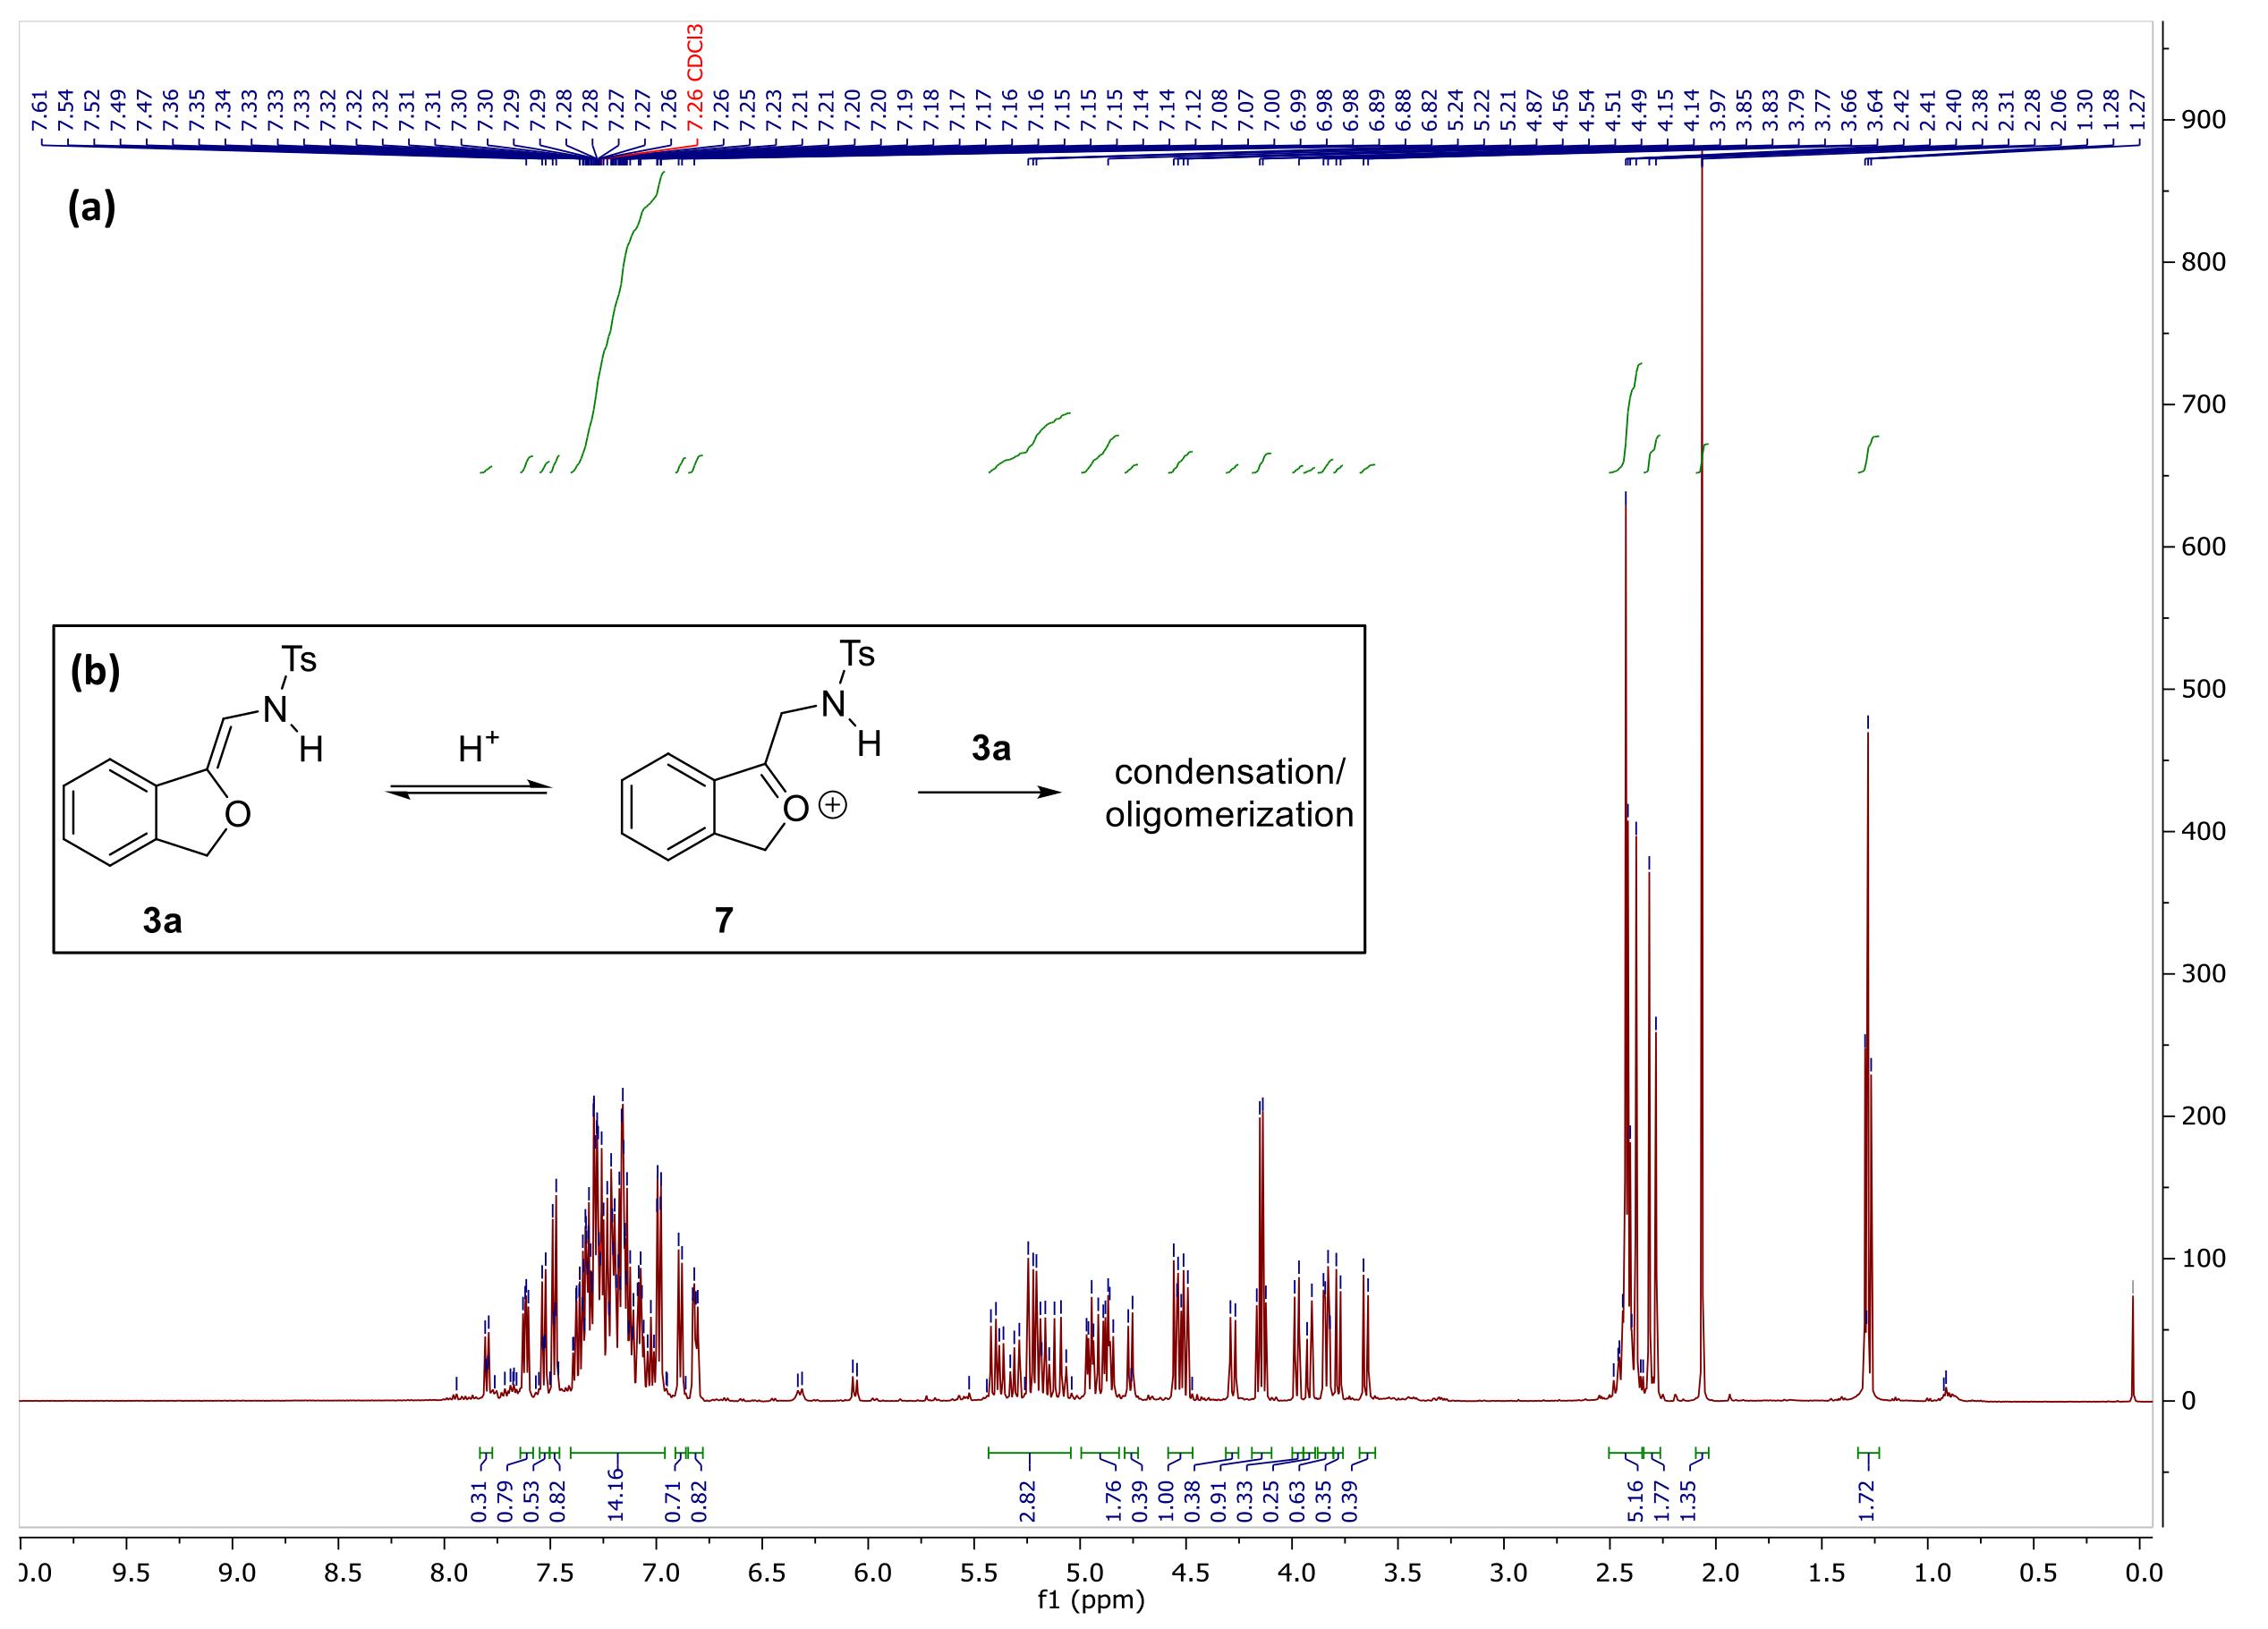 Preparation of N-(2-alkoxyvinyl)sulfonamides from N-tosyl-1